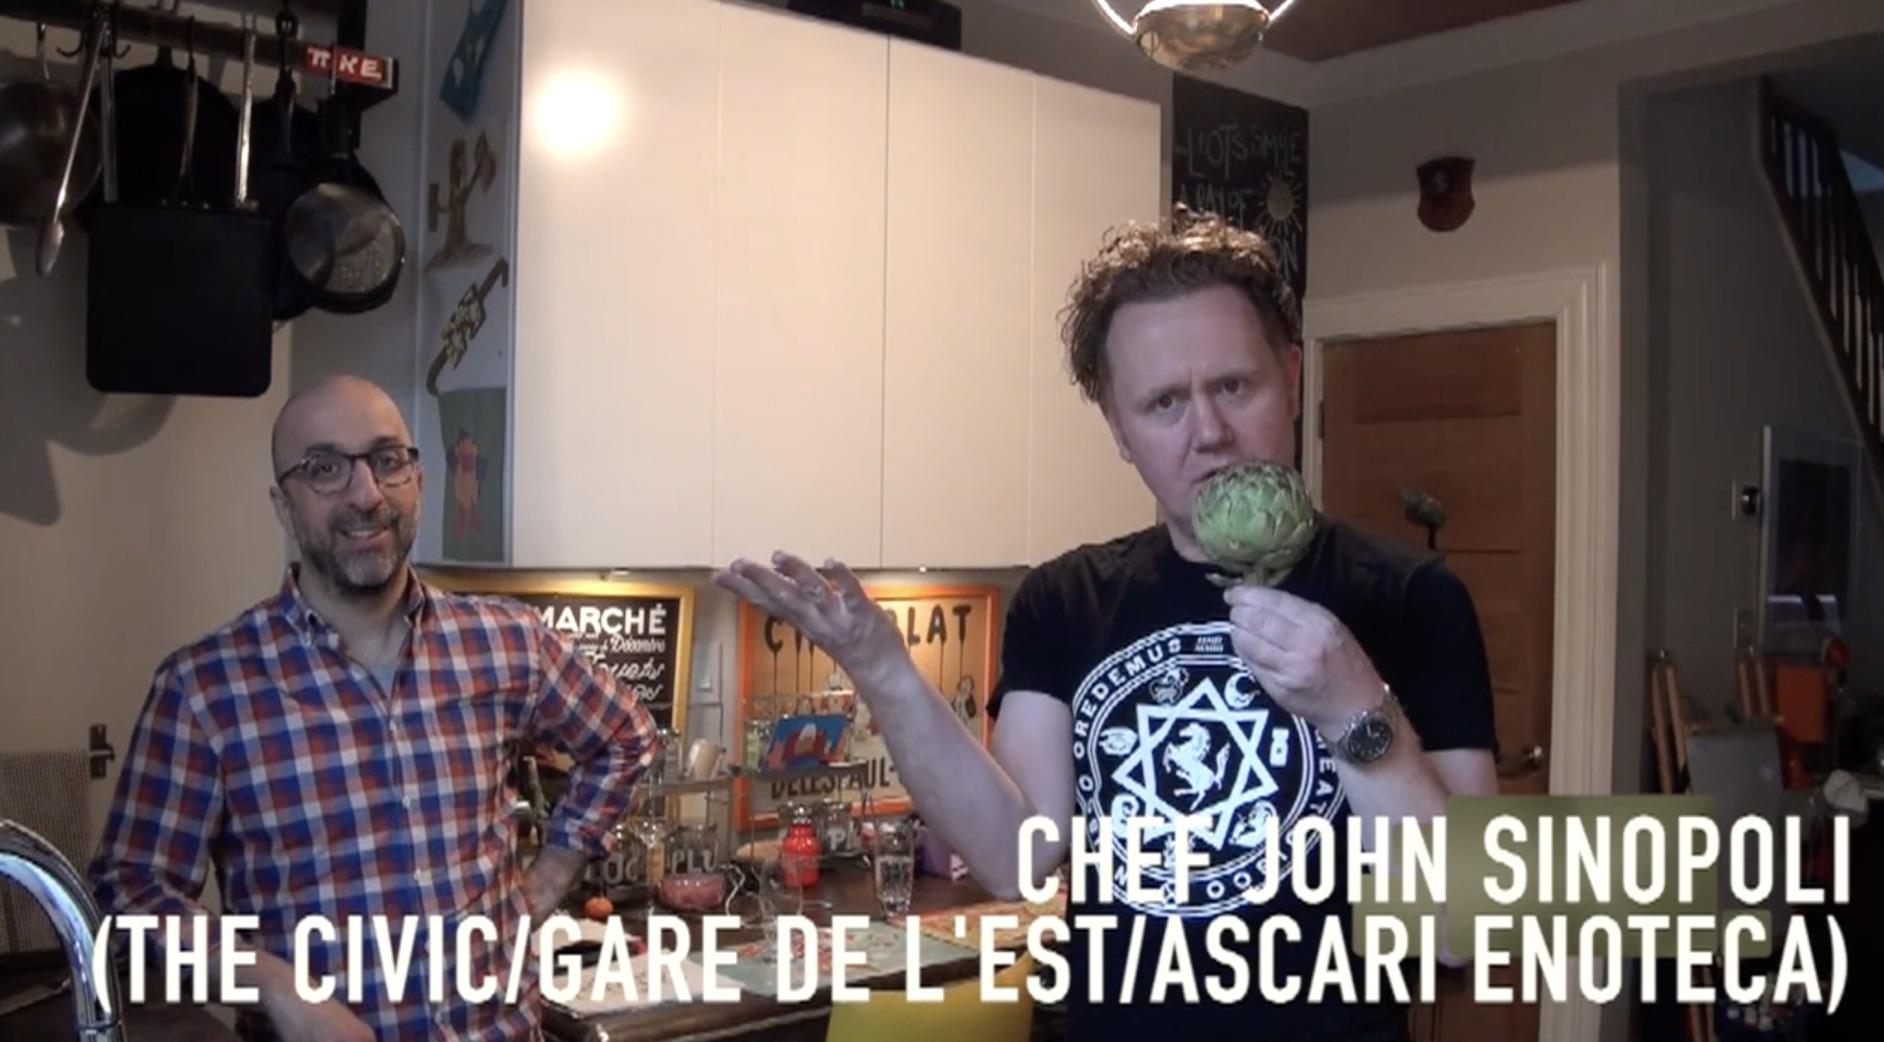 Toronto's John Sinopoli explains how to prepare the rather tricky artichoke using Wüsthof's Classic Icon range.